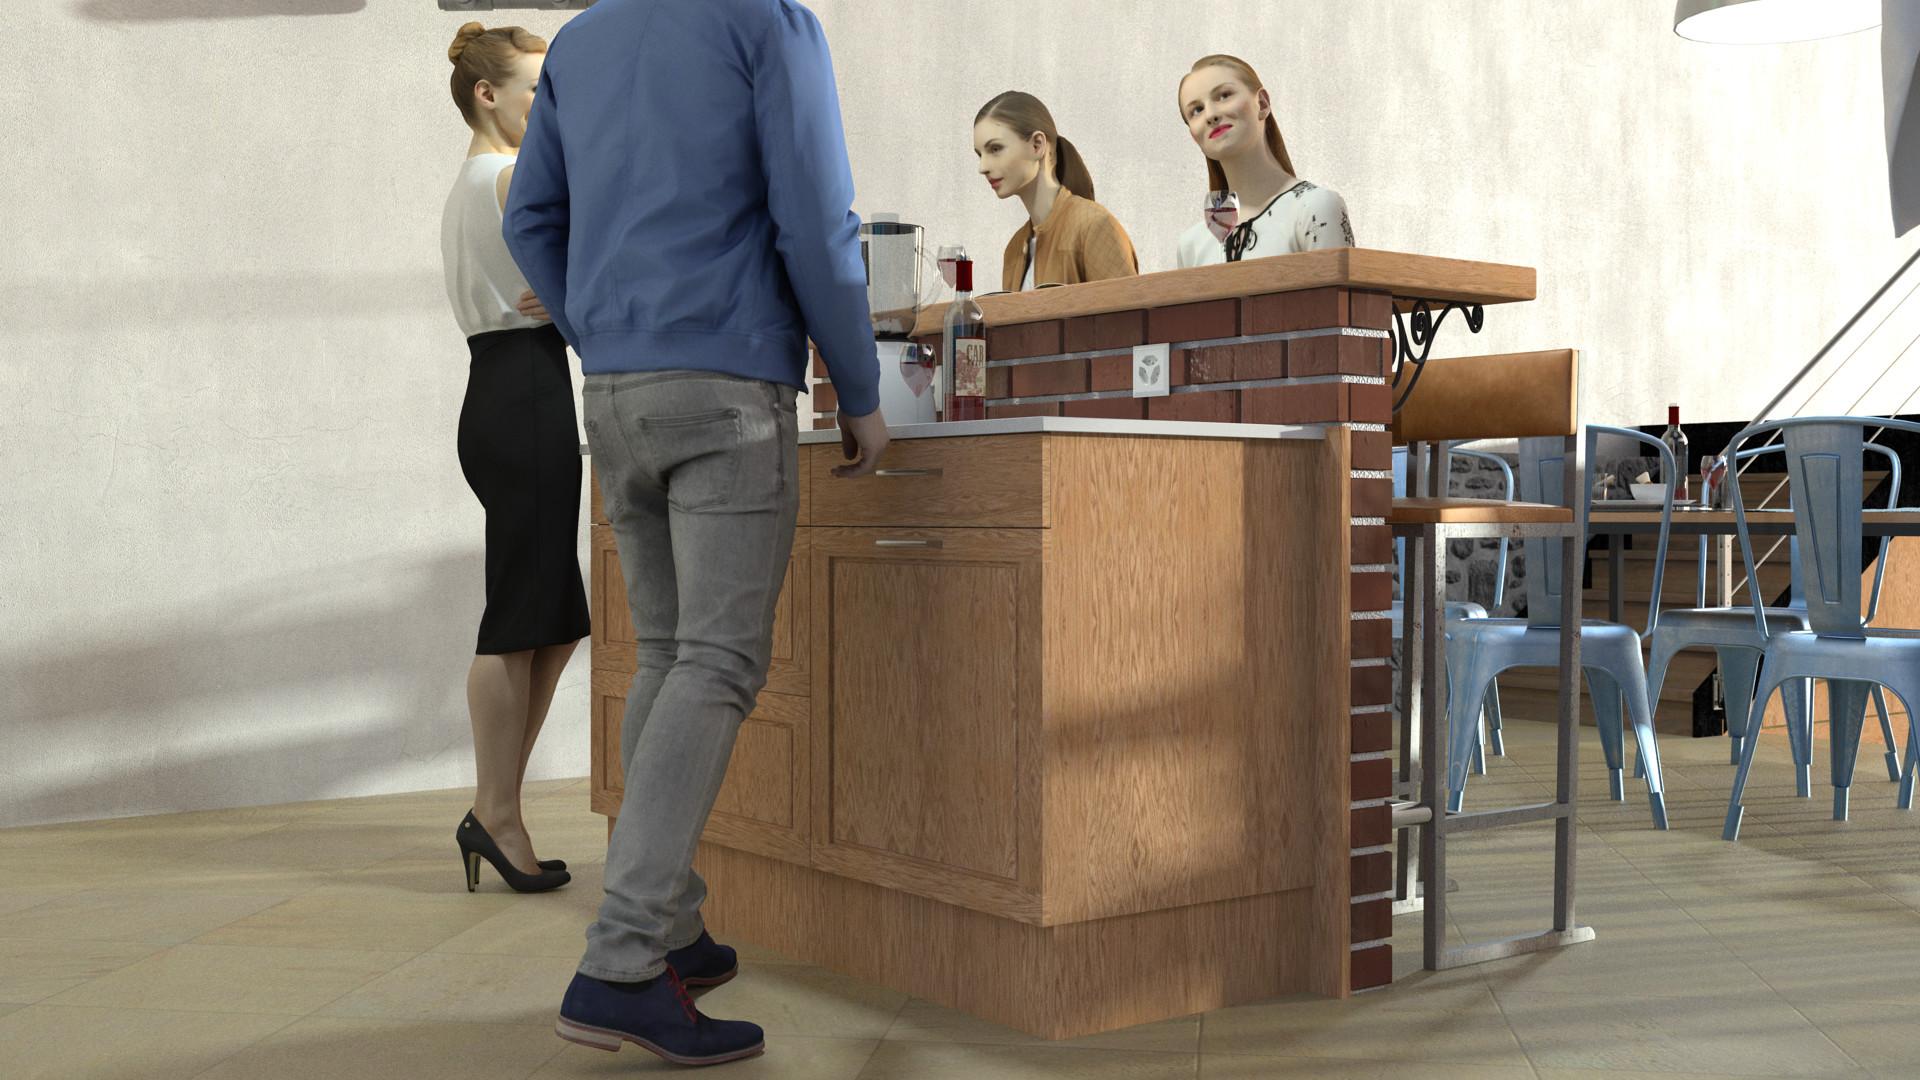 Duane kemp rivendell brick bar 2017 scene 10